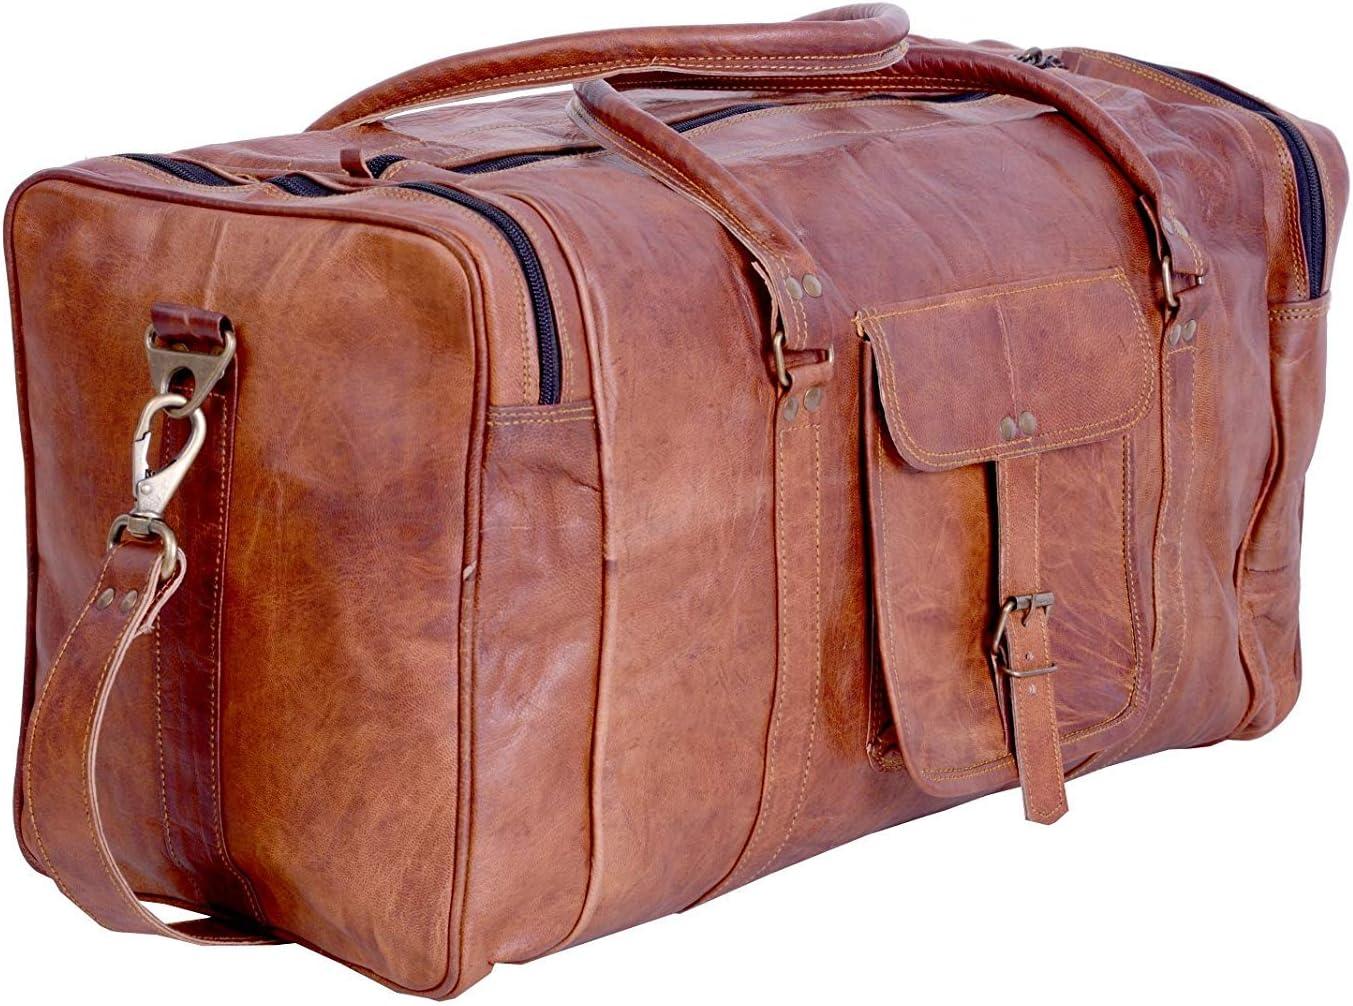 KPL Vintage Leather Duffel Bag